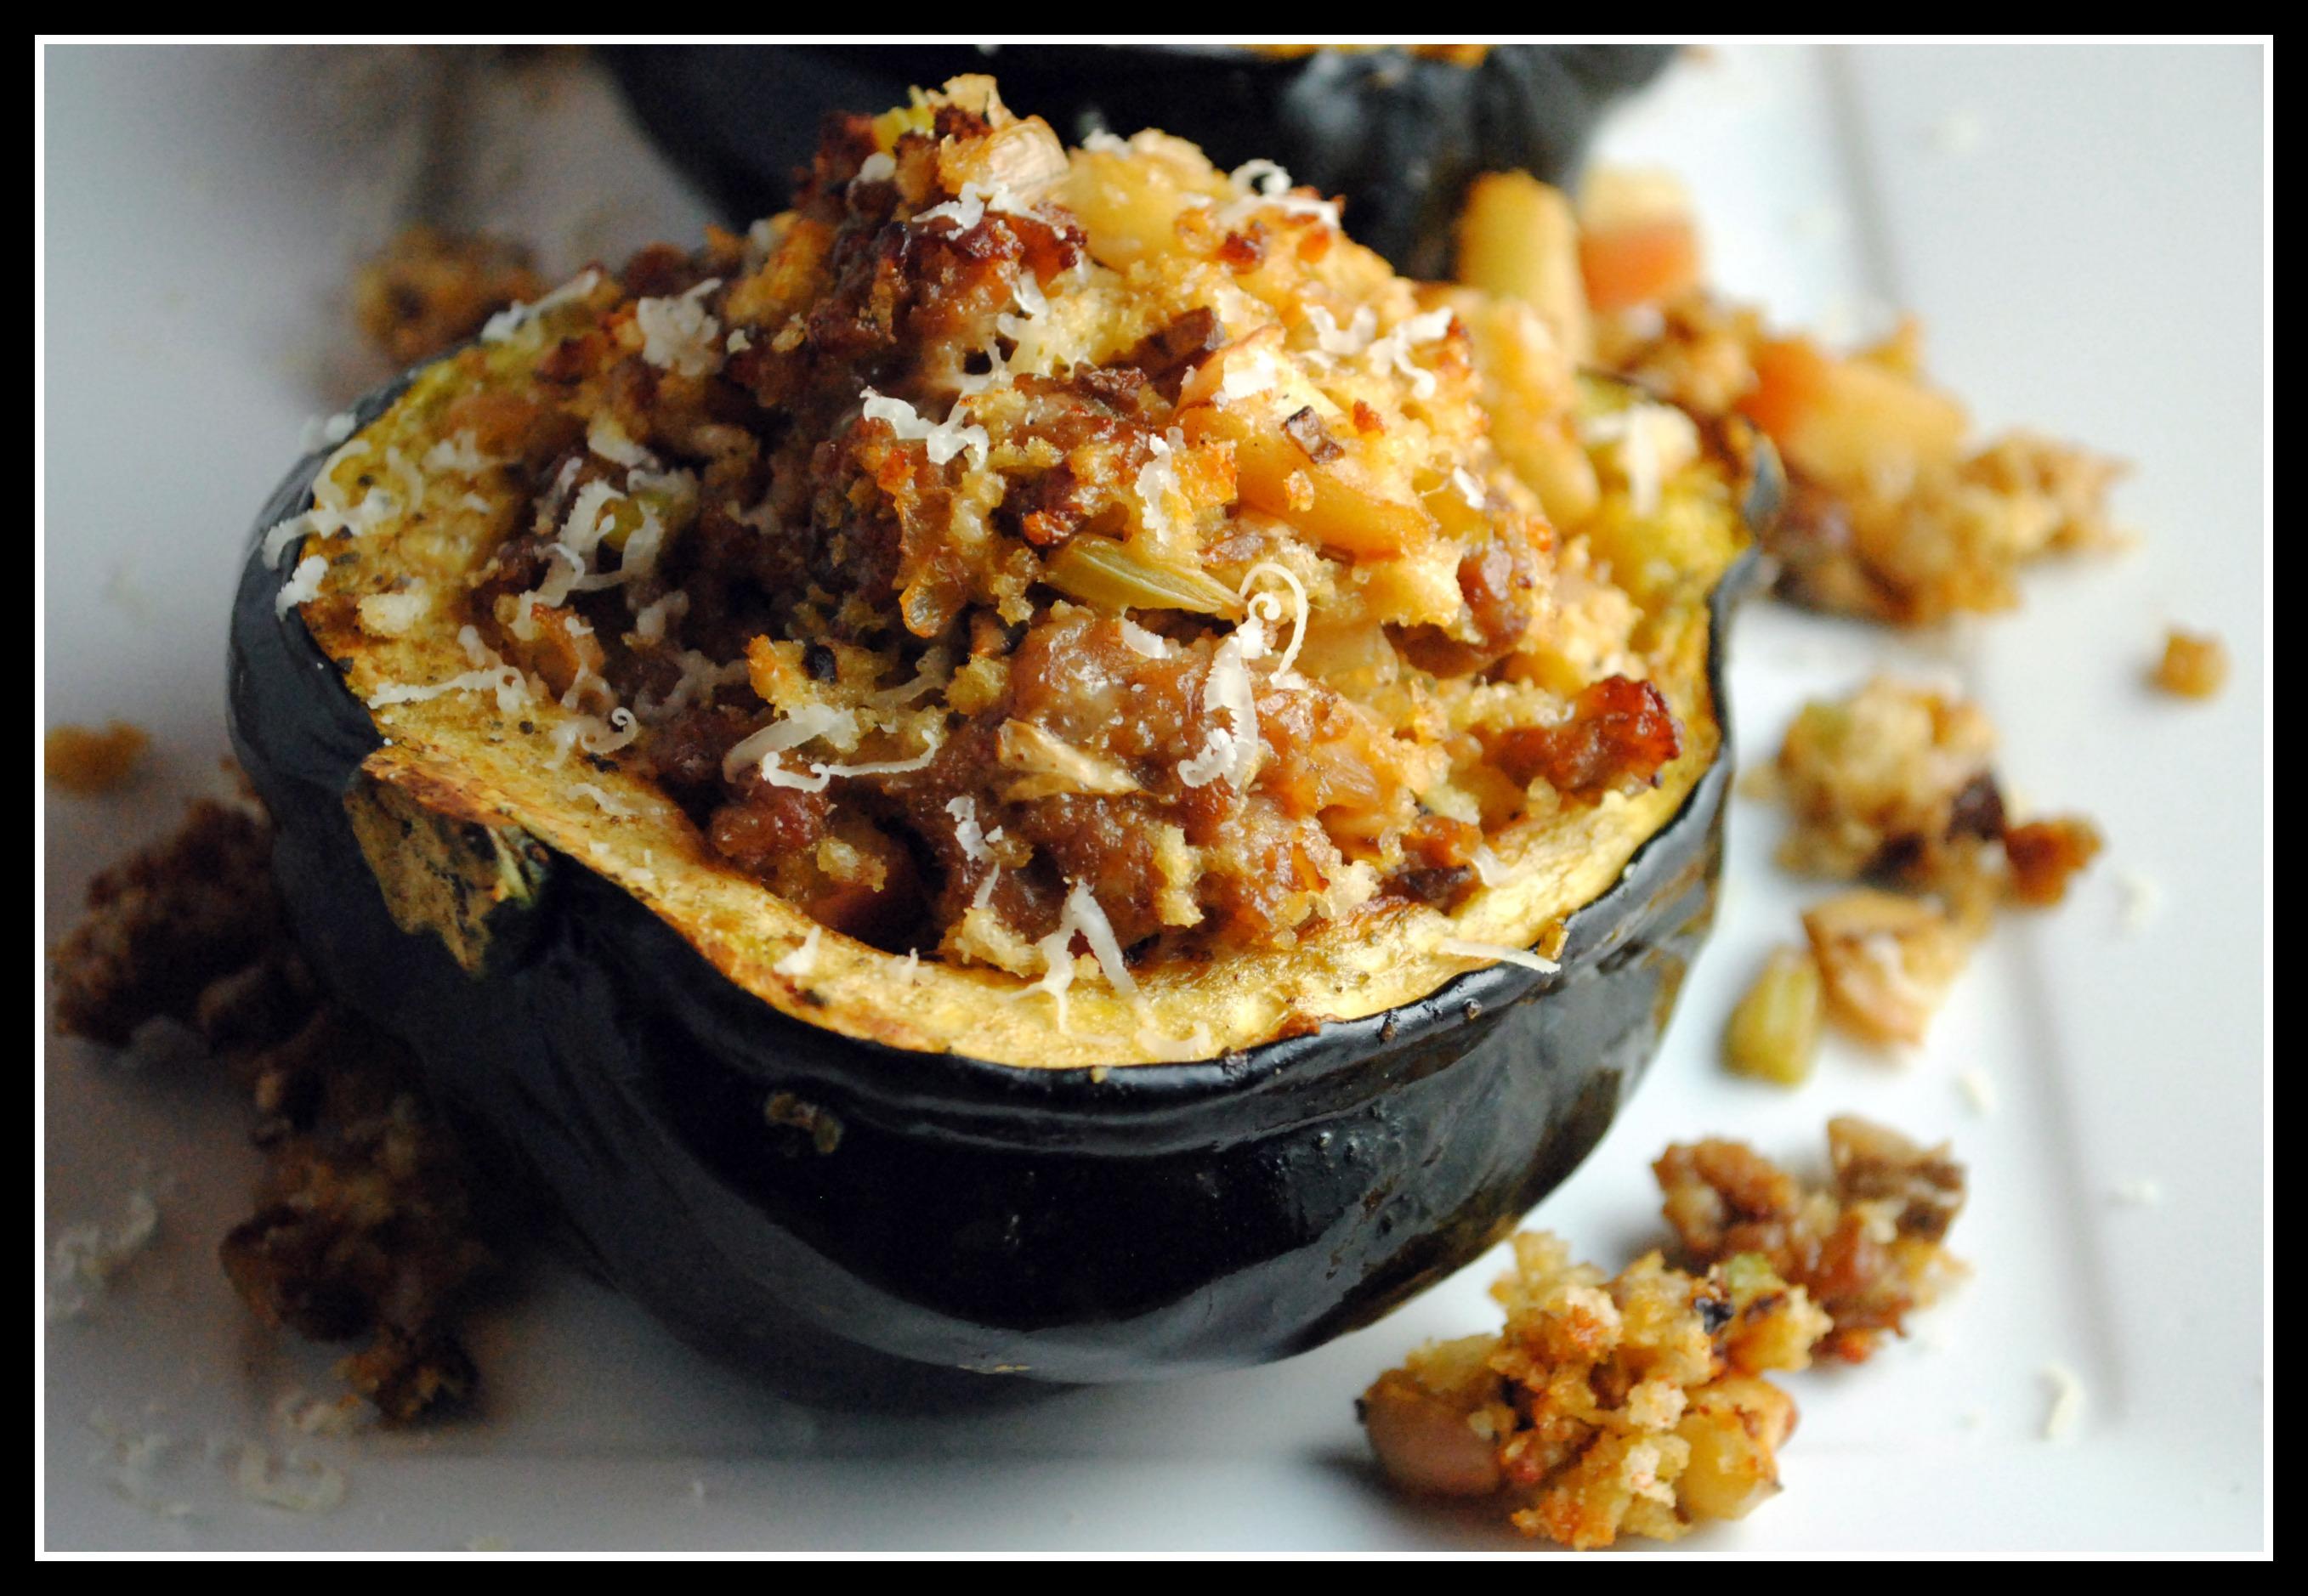 ... wild rice stuffed acorn squash roasted acorn squash roast acorn squash